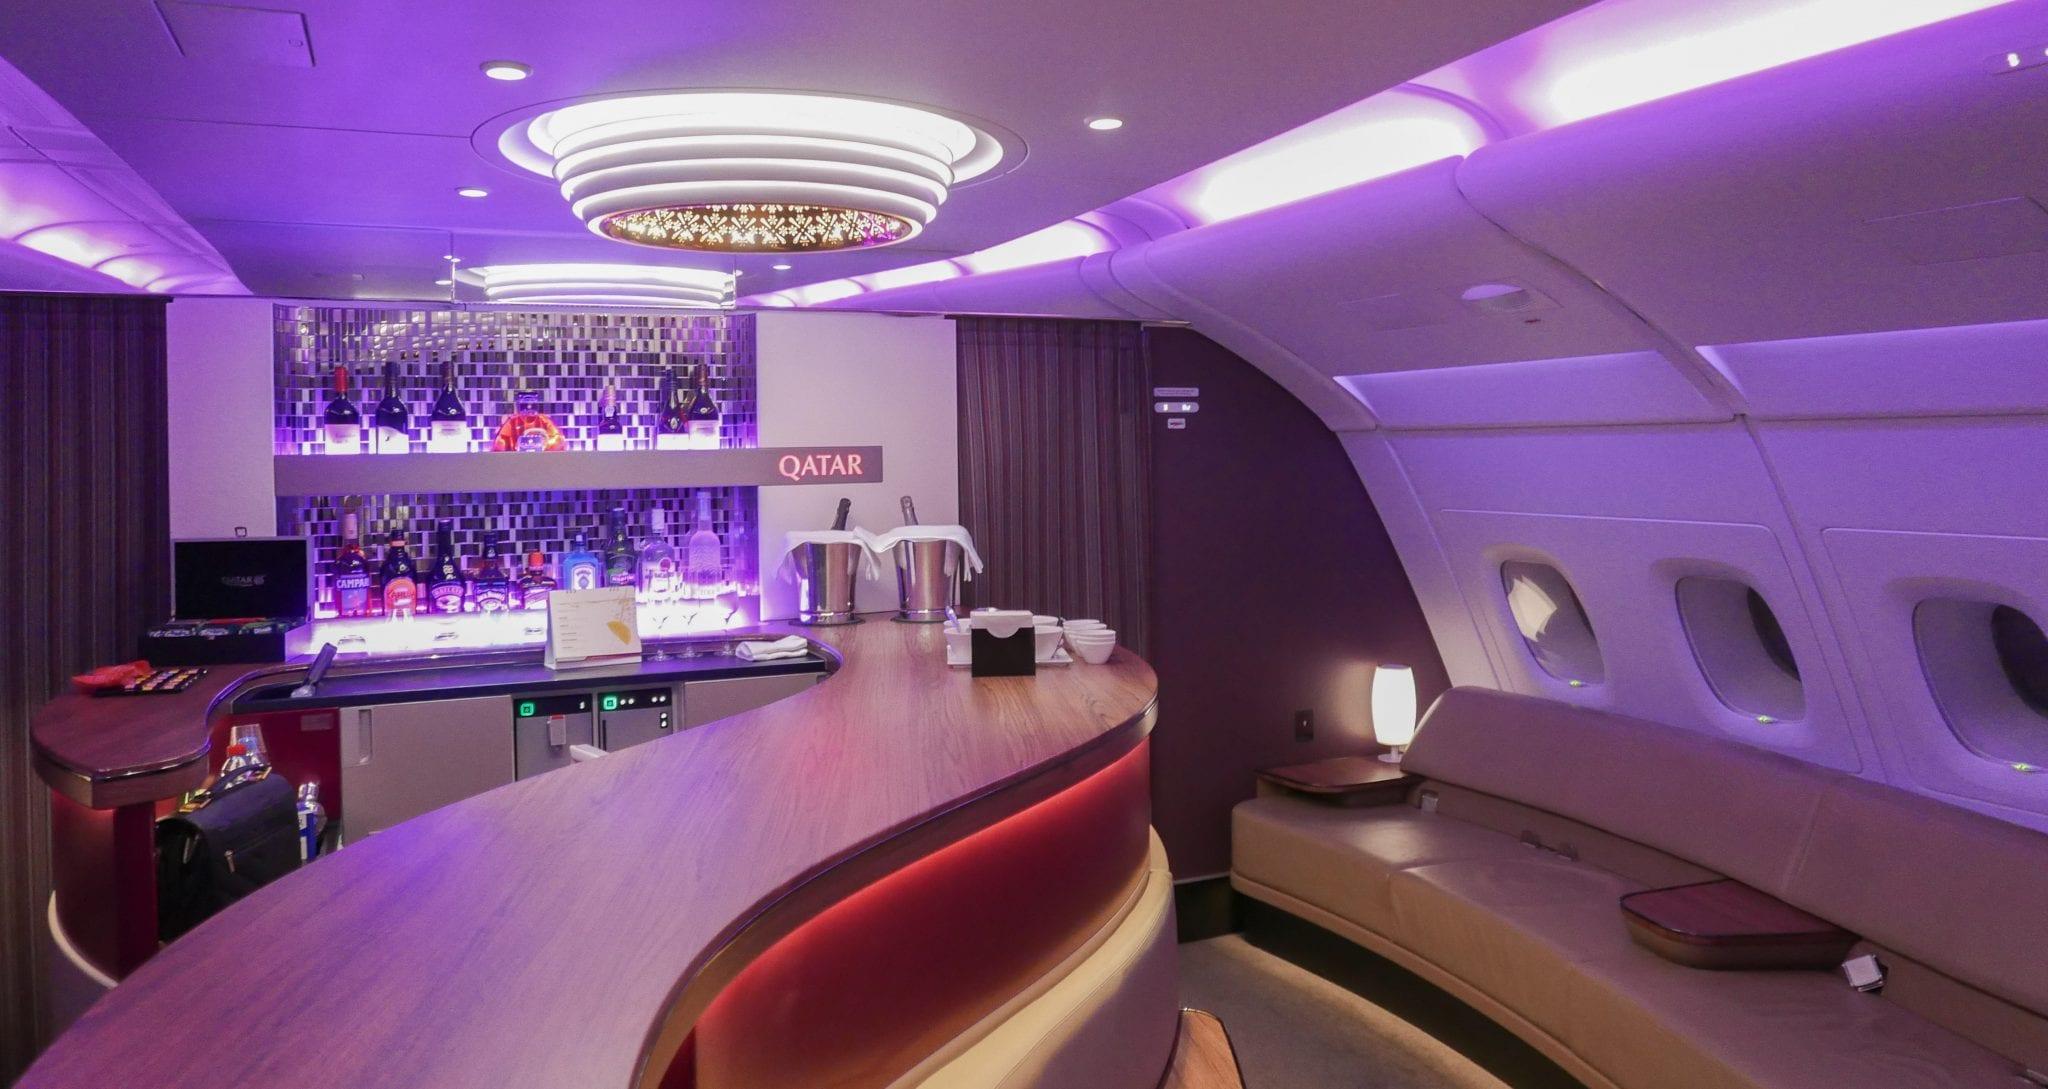 qatar bar 1 1 - Why I love airline schedule changes...